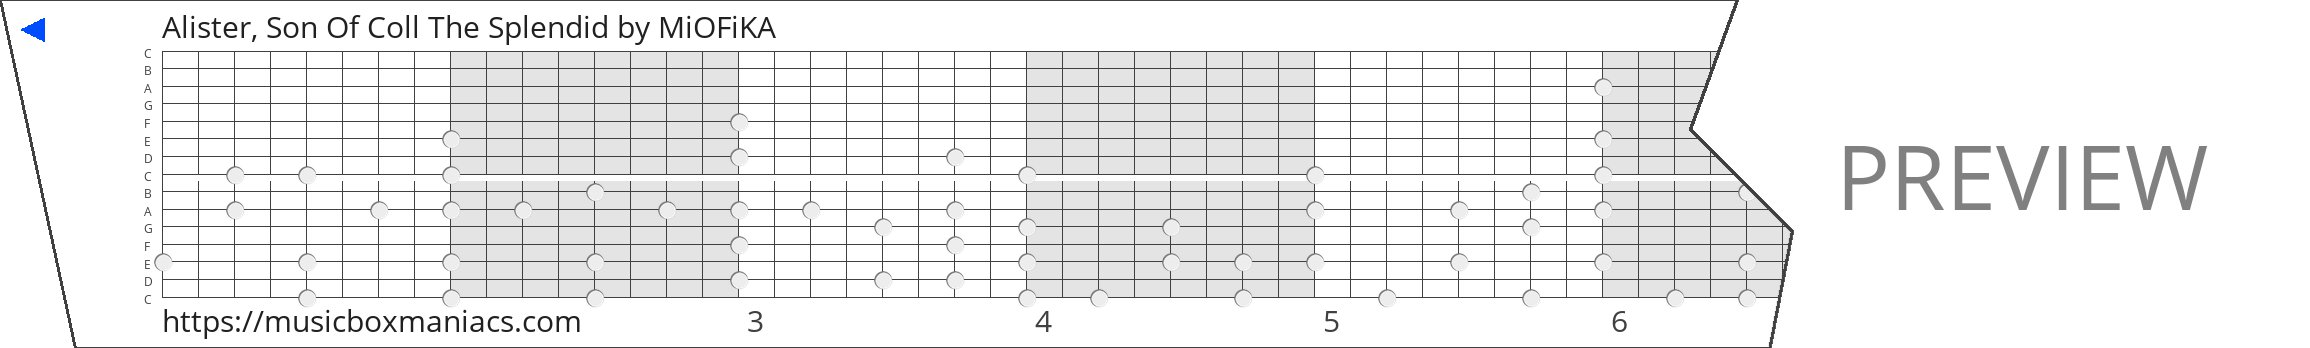 Alister, Son Of Coll The Splendid 15 note music box paper strip